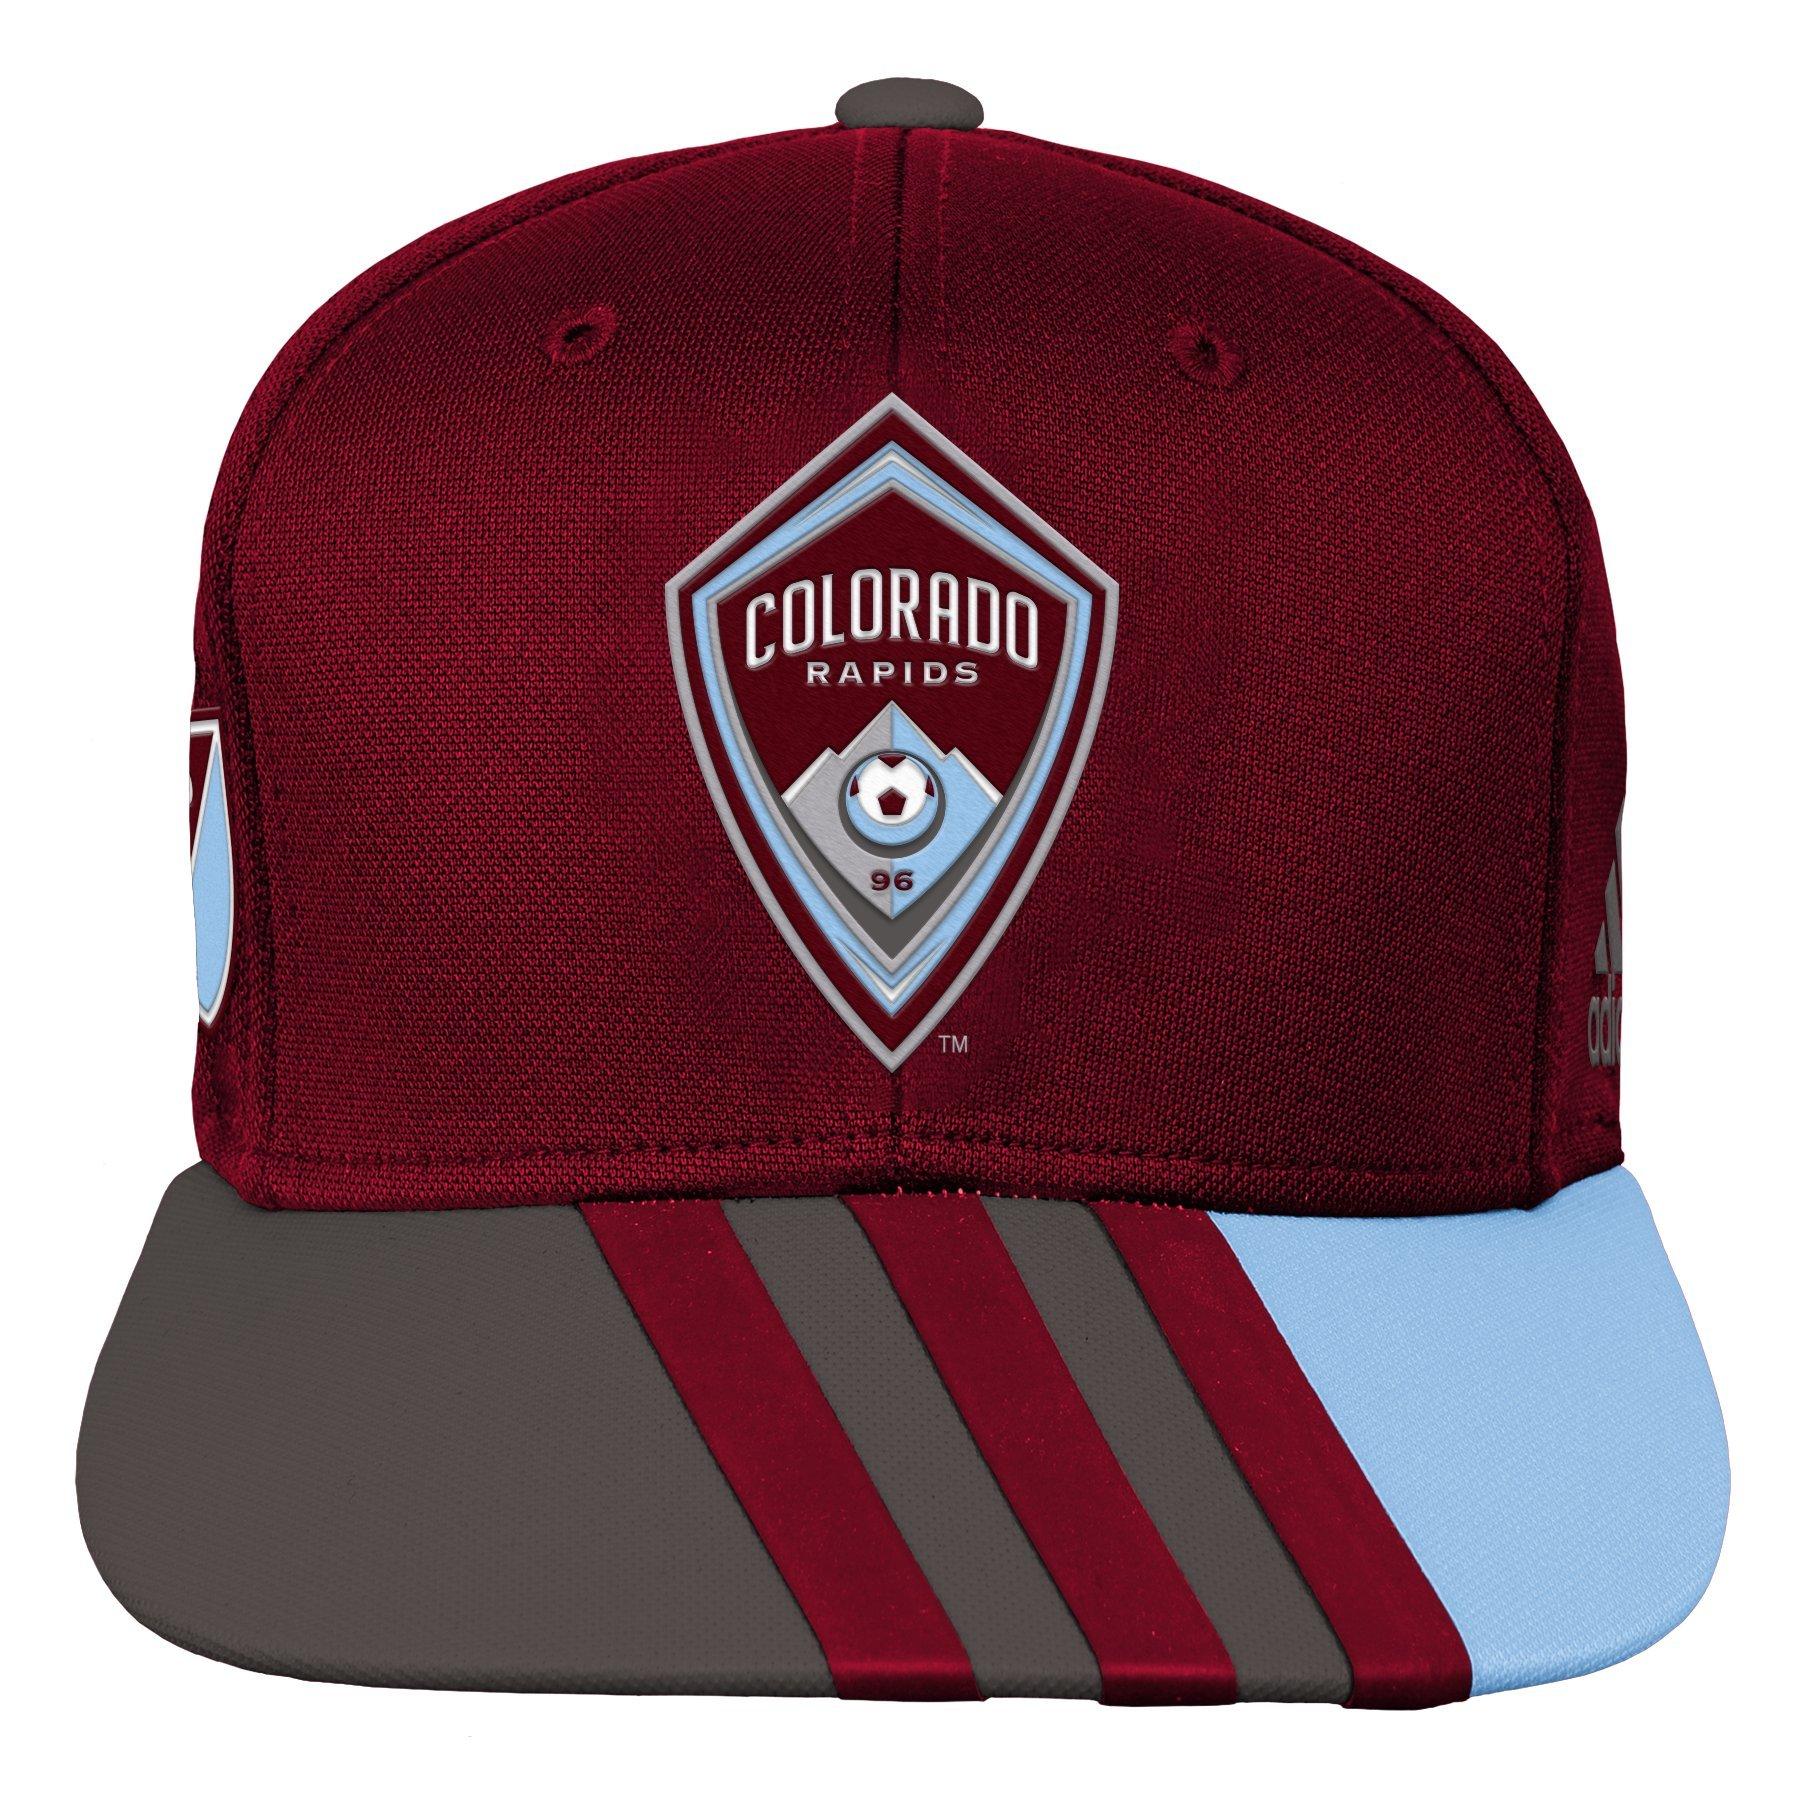 Outerstuff MLS Colorado Rapids R S8FMK Youth Boys Flatbrim Snapback, One Size (8), Burgundy